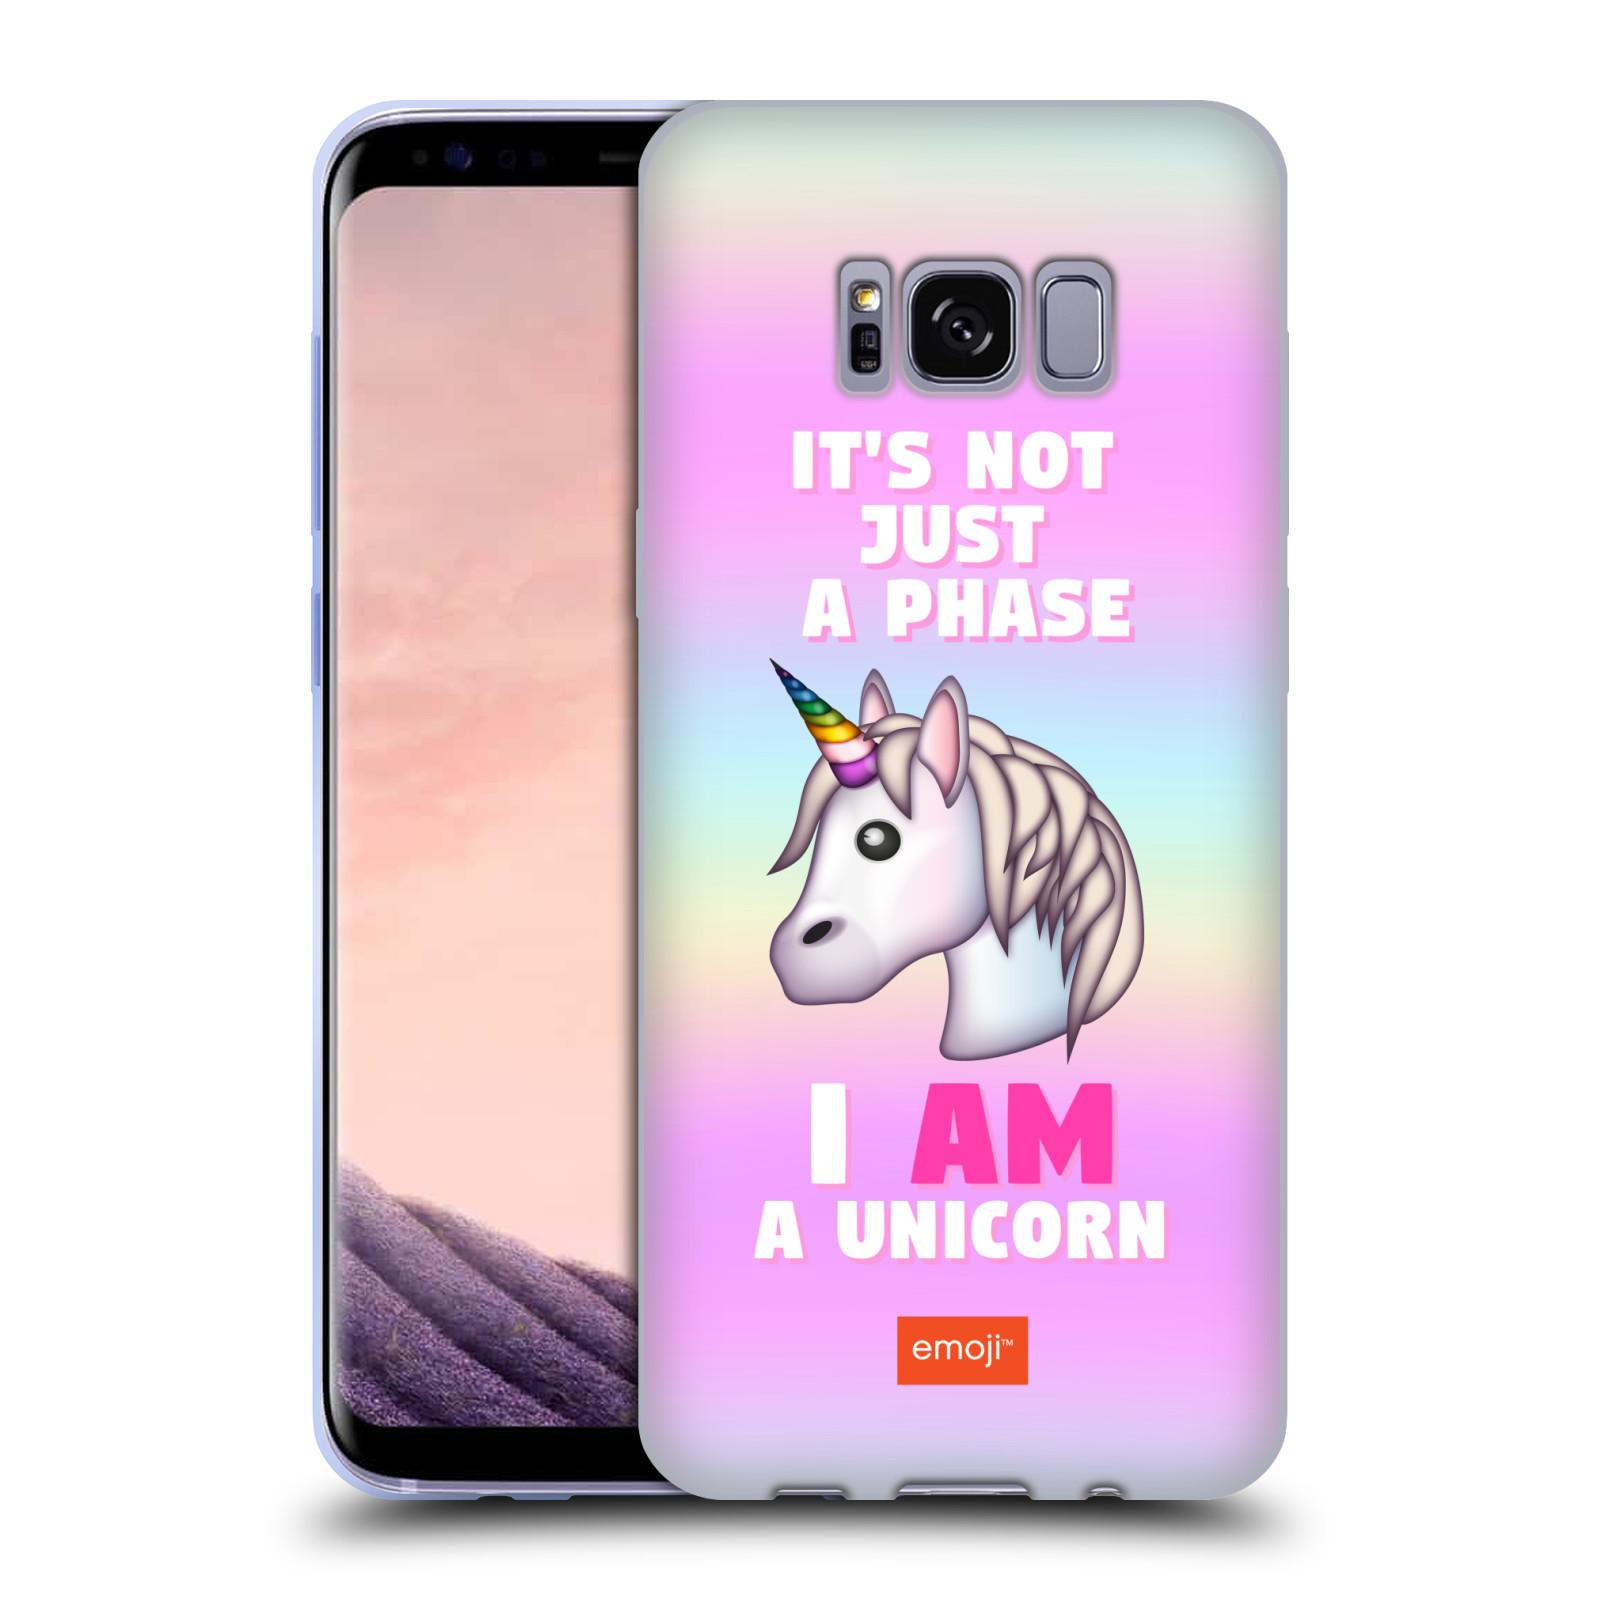 HEAD CASE silikonový obal na mobil Samsung Galaxy S8 smajlíci oficiální  kryt EMOJI vzor jednorožec růžová I AM UNICORN 6bfde97e494